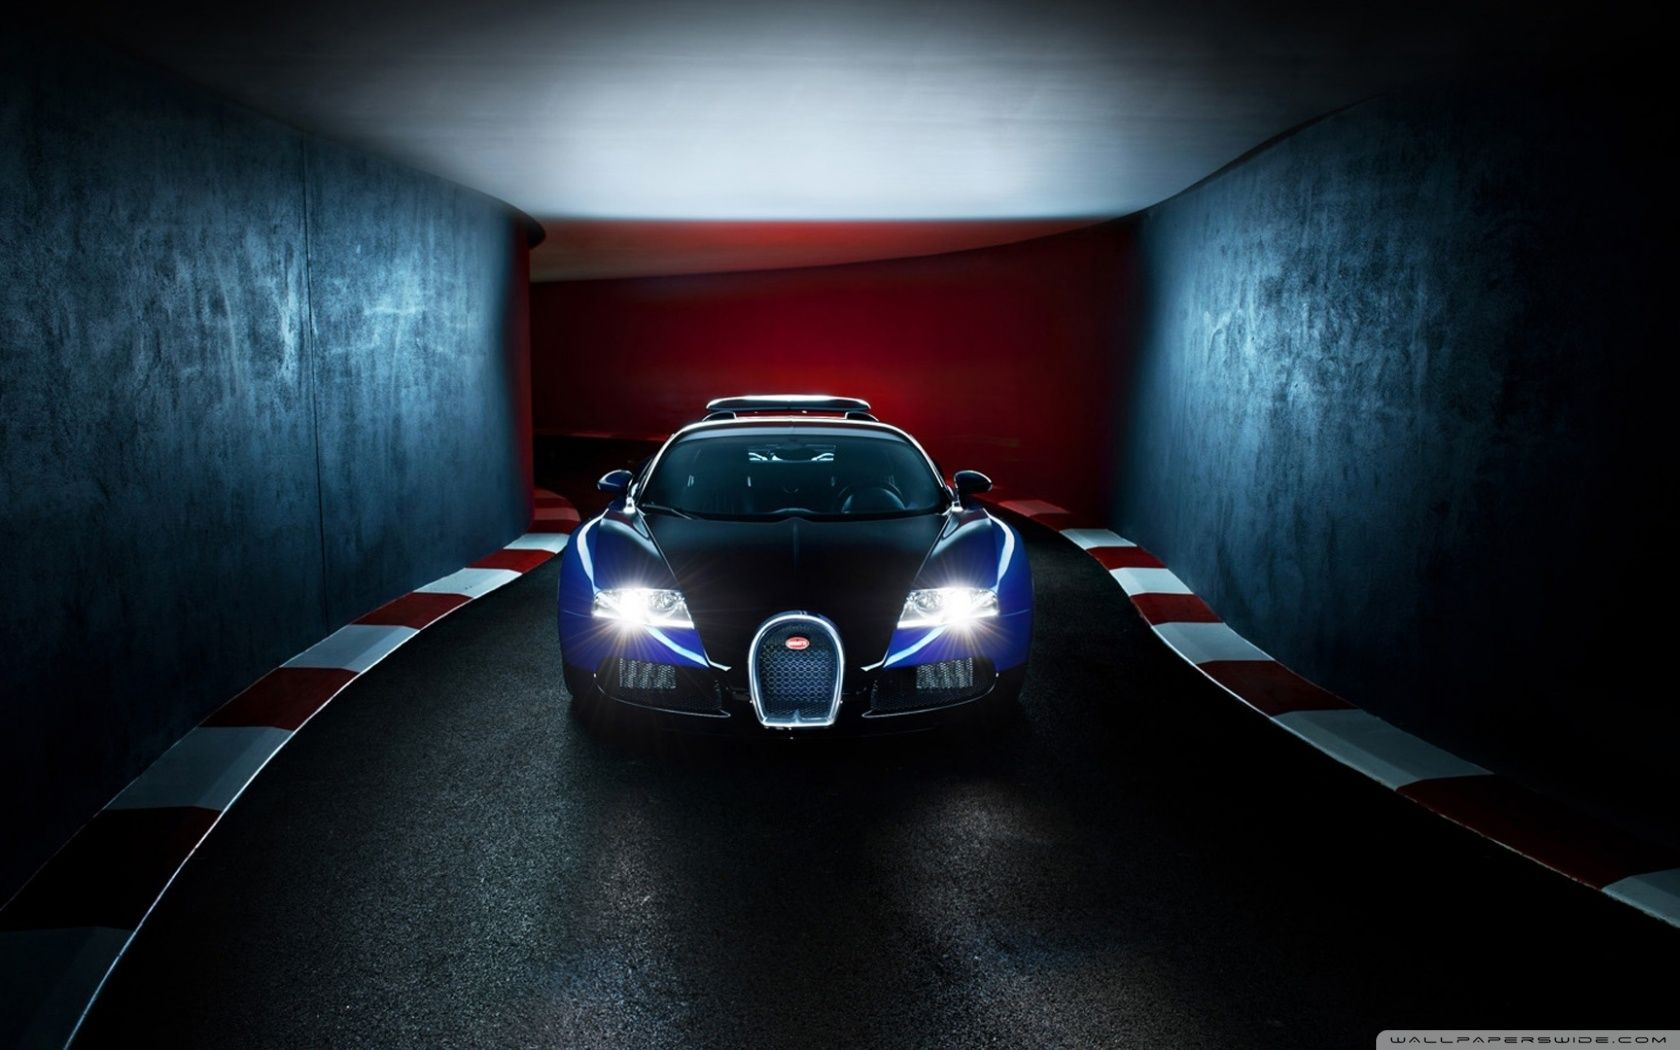 Blue Bugatti Wallpapers Top Free Blue Bugatti Backgrounds Wallpaperaccess